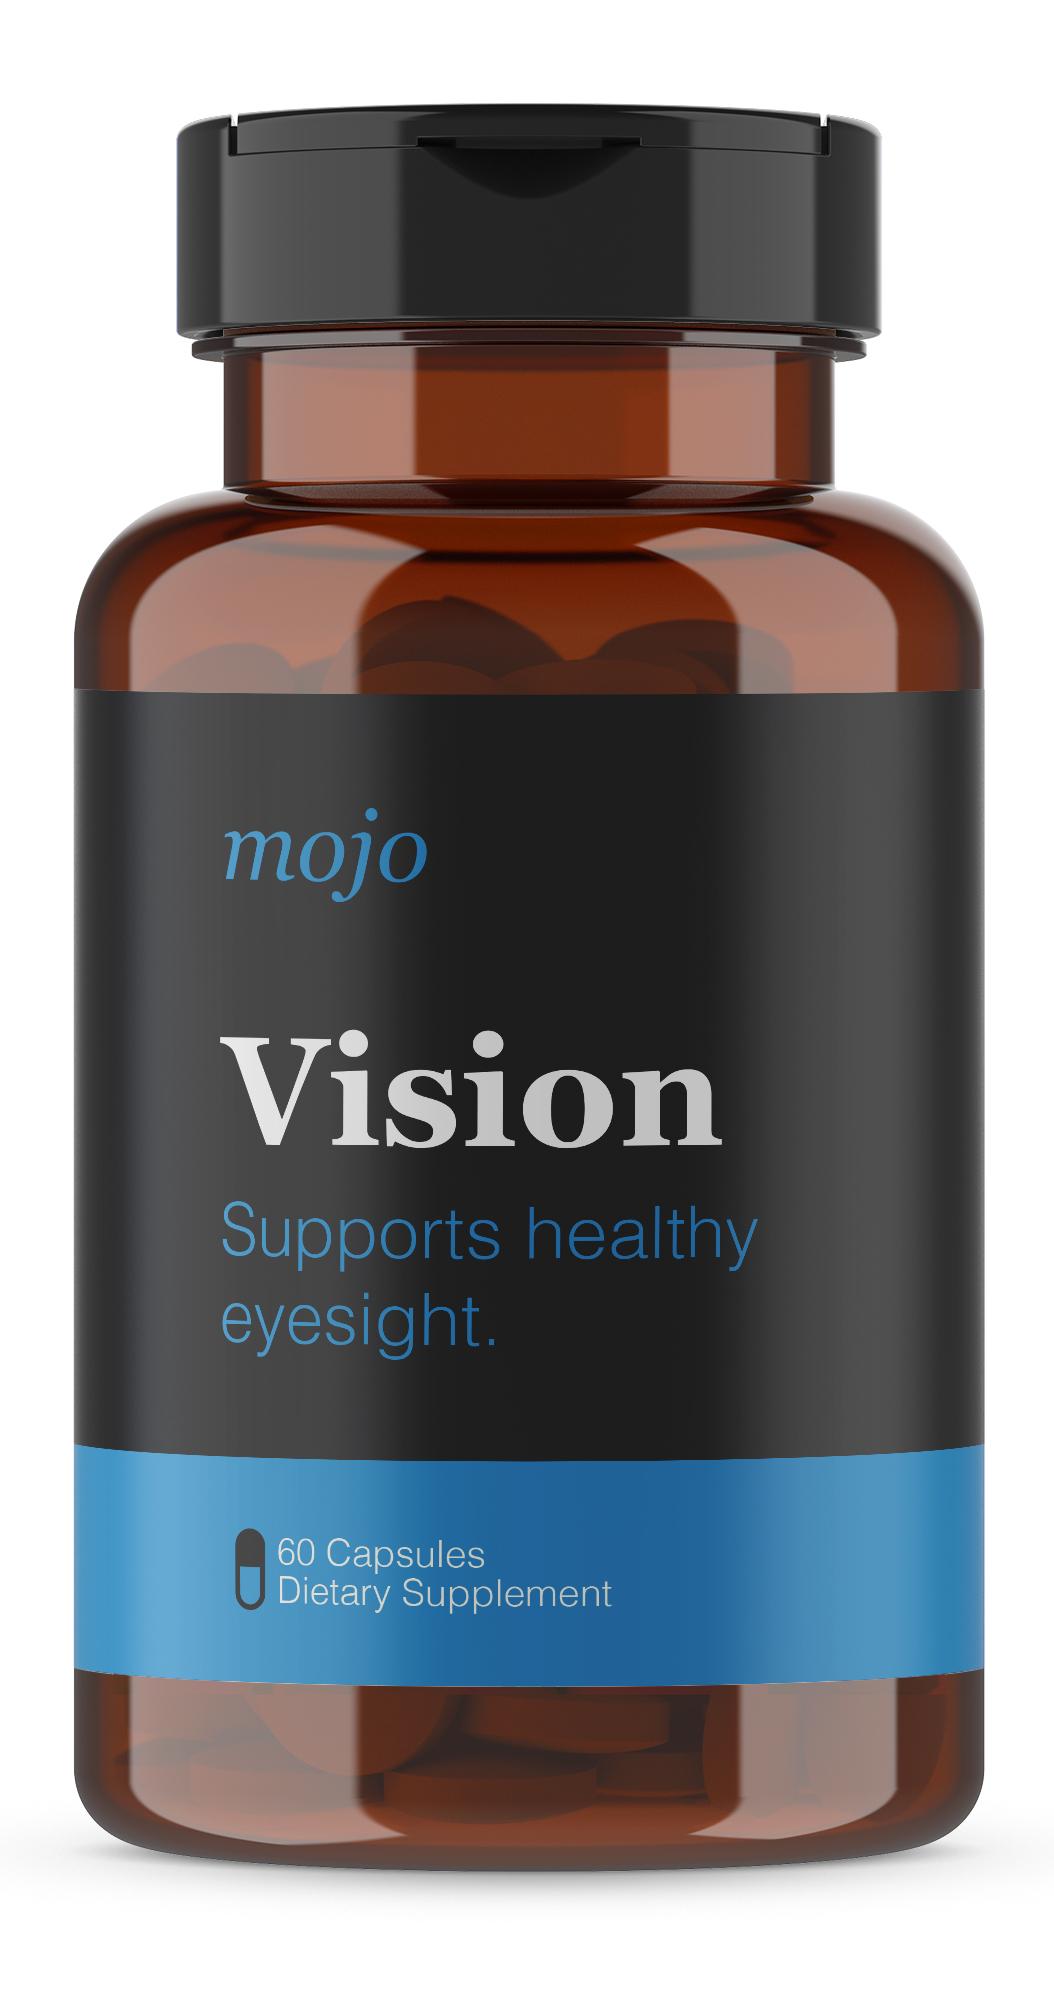 mojo-vision-supplement-amber